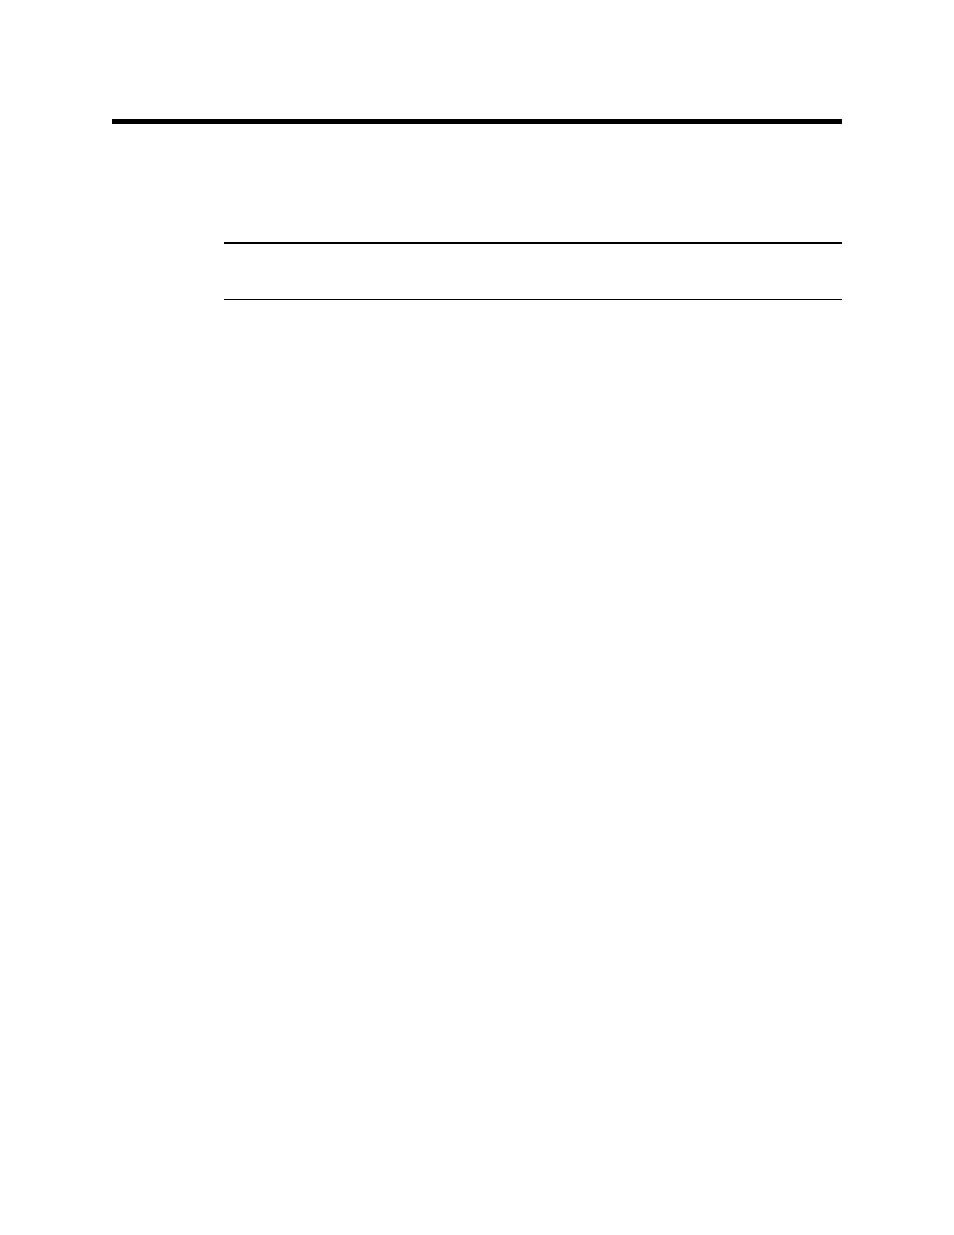 Irda downloading cable | RKI Instruments GX-2012 User Manual